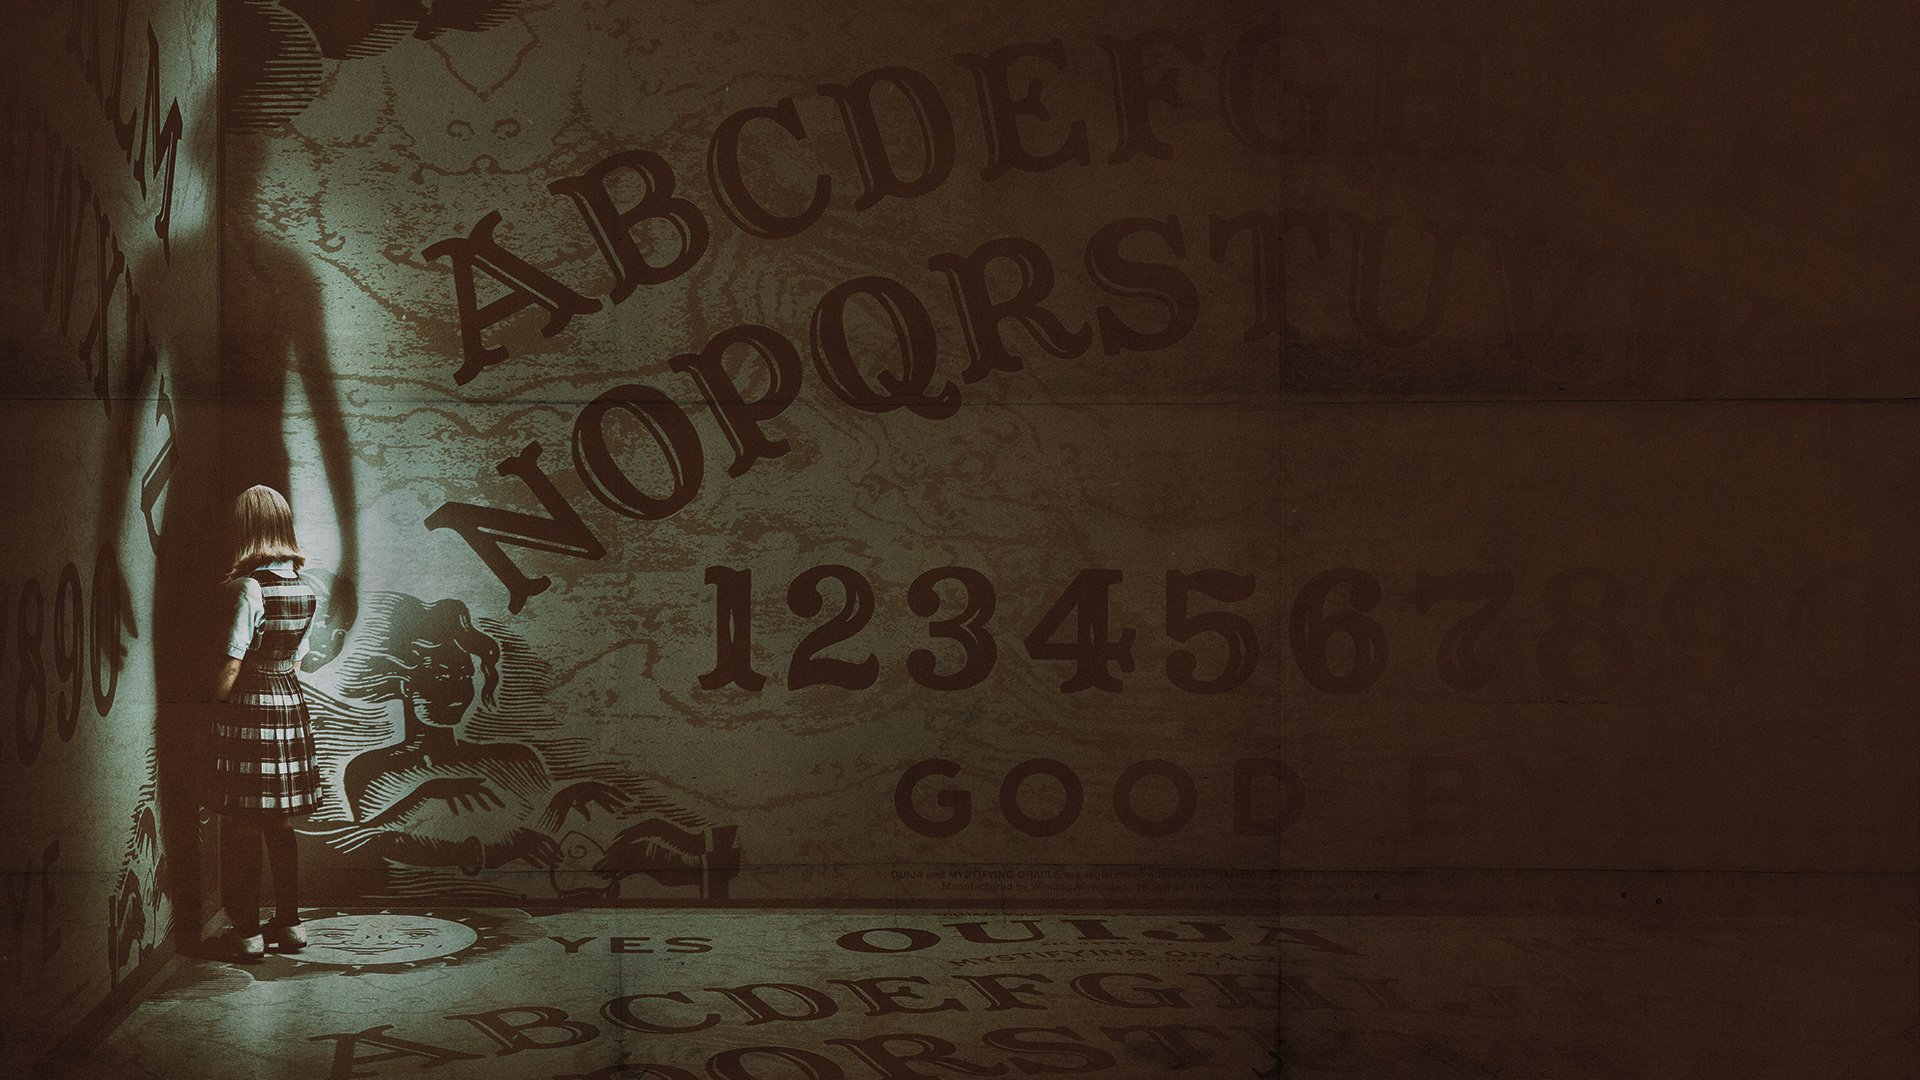 Ouija Origin Of Evil HD Wallpaper Background Image 1920x1080 1920x1080